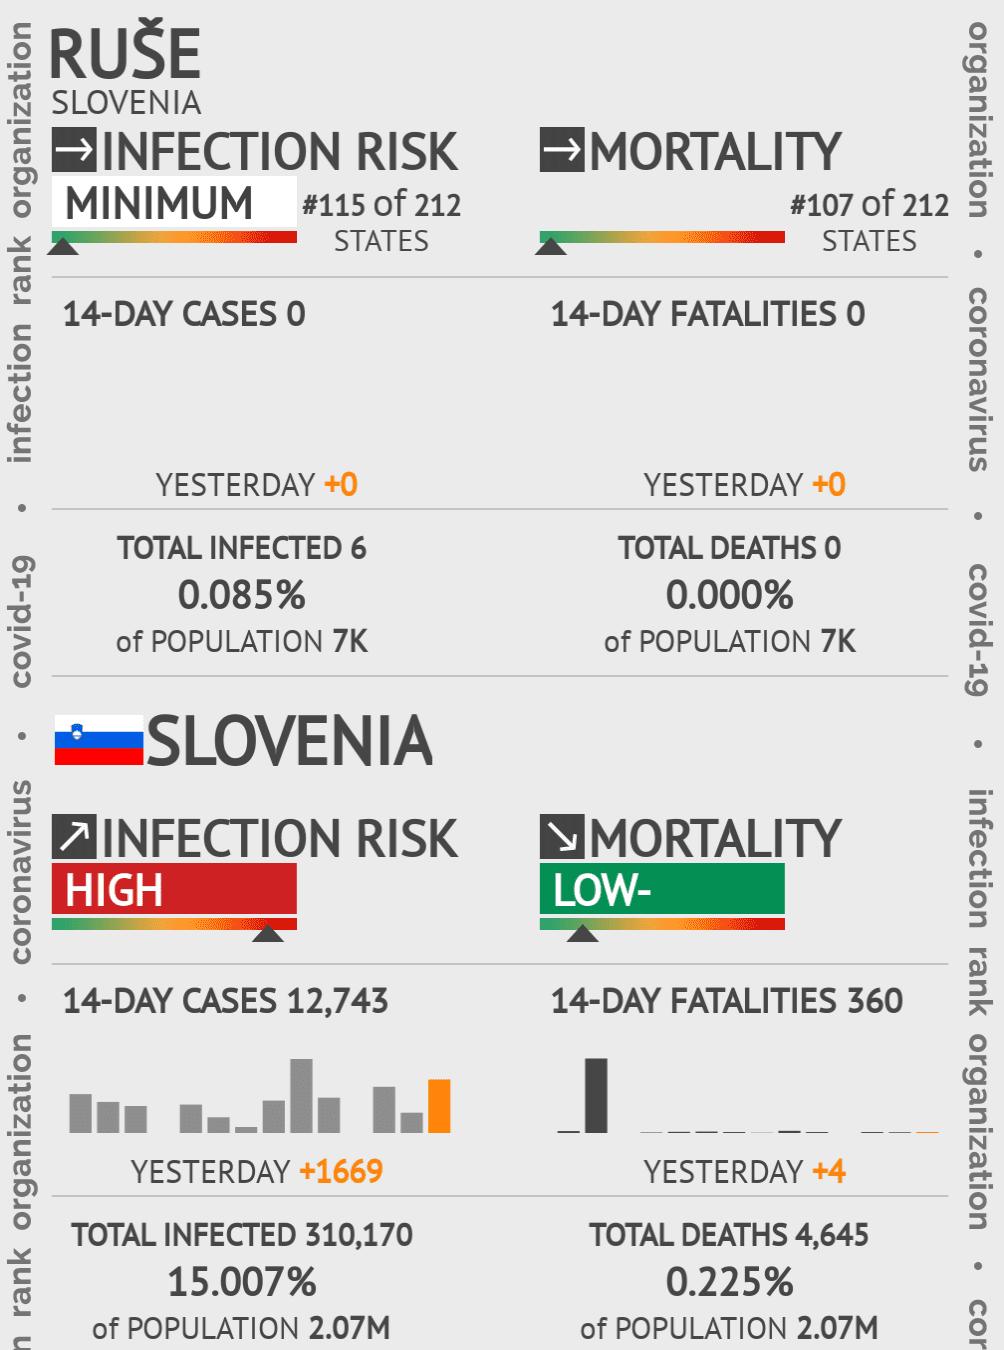 Ruše Coronavirus Covid-19 Risk of Infection on May 14, 2020